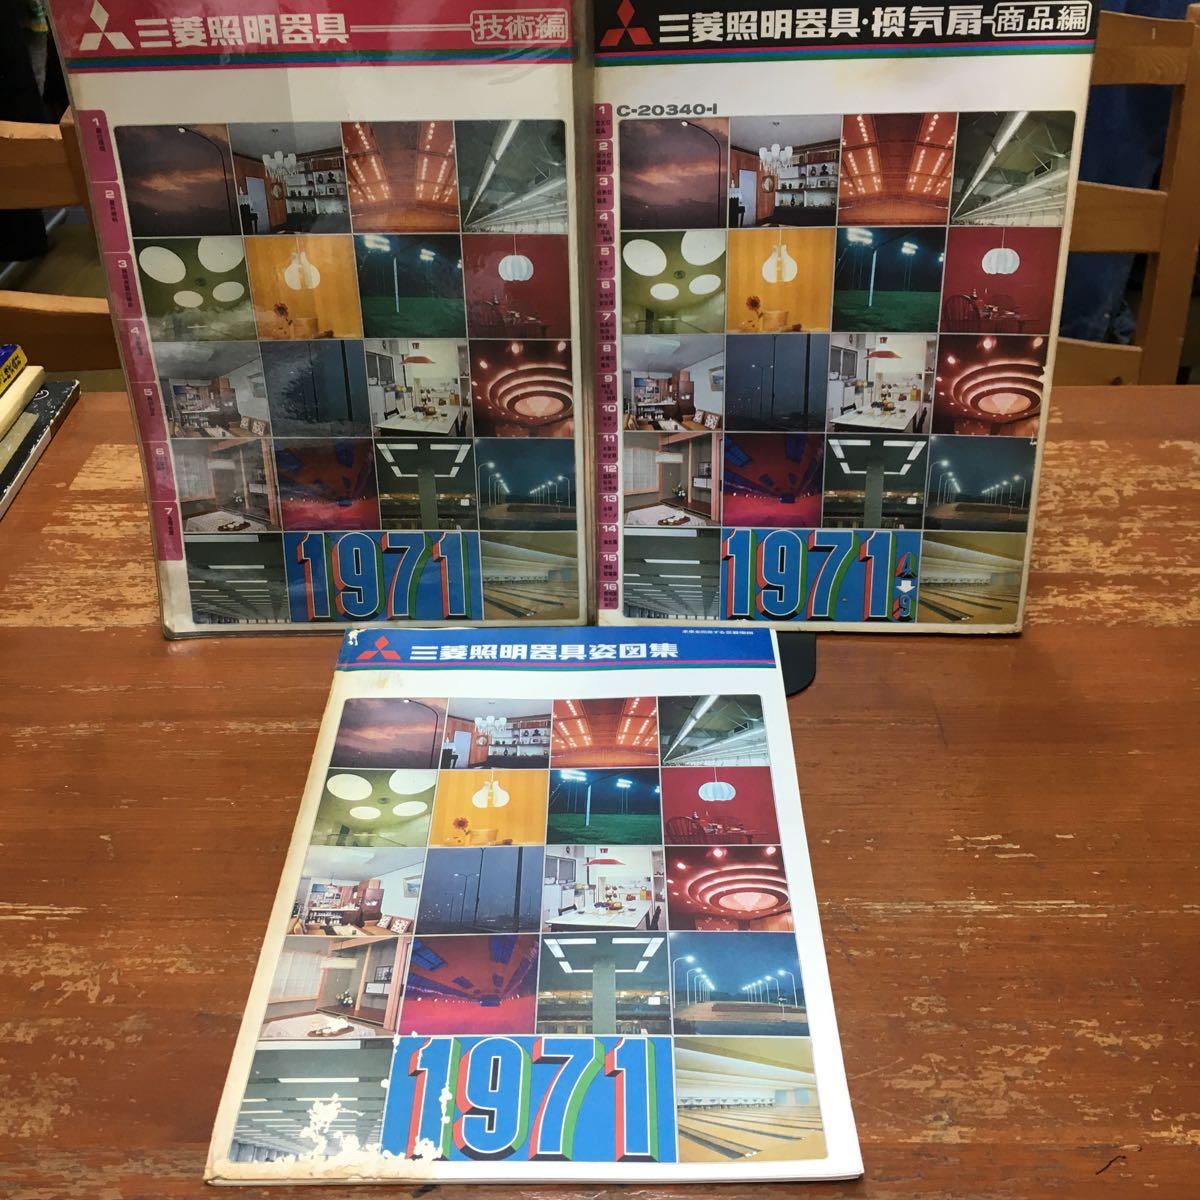 三菱照明器具/換気扇/カタログ/1971年・姿図集・照明器具技術編